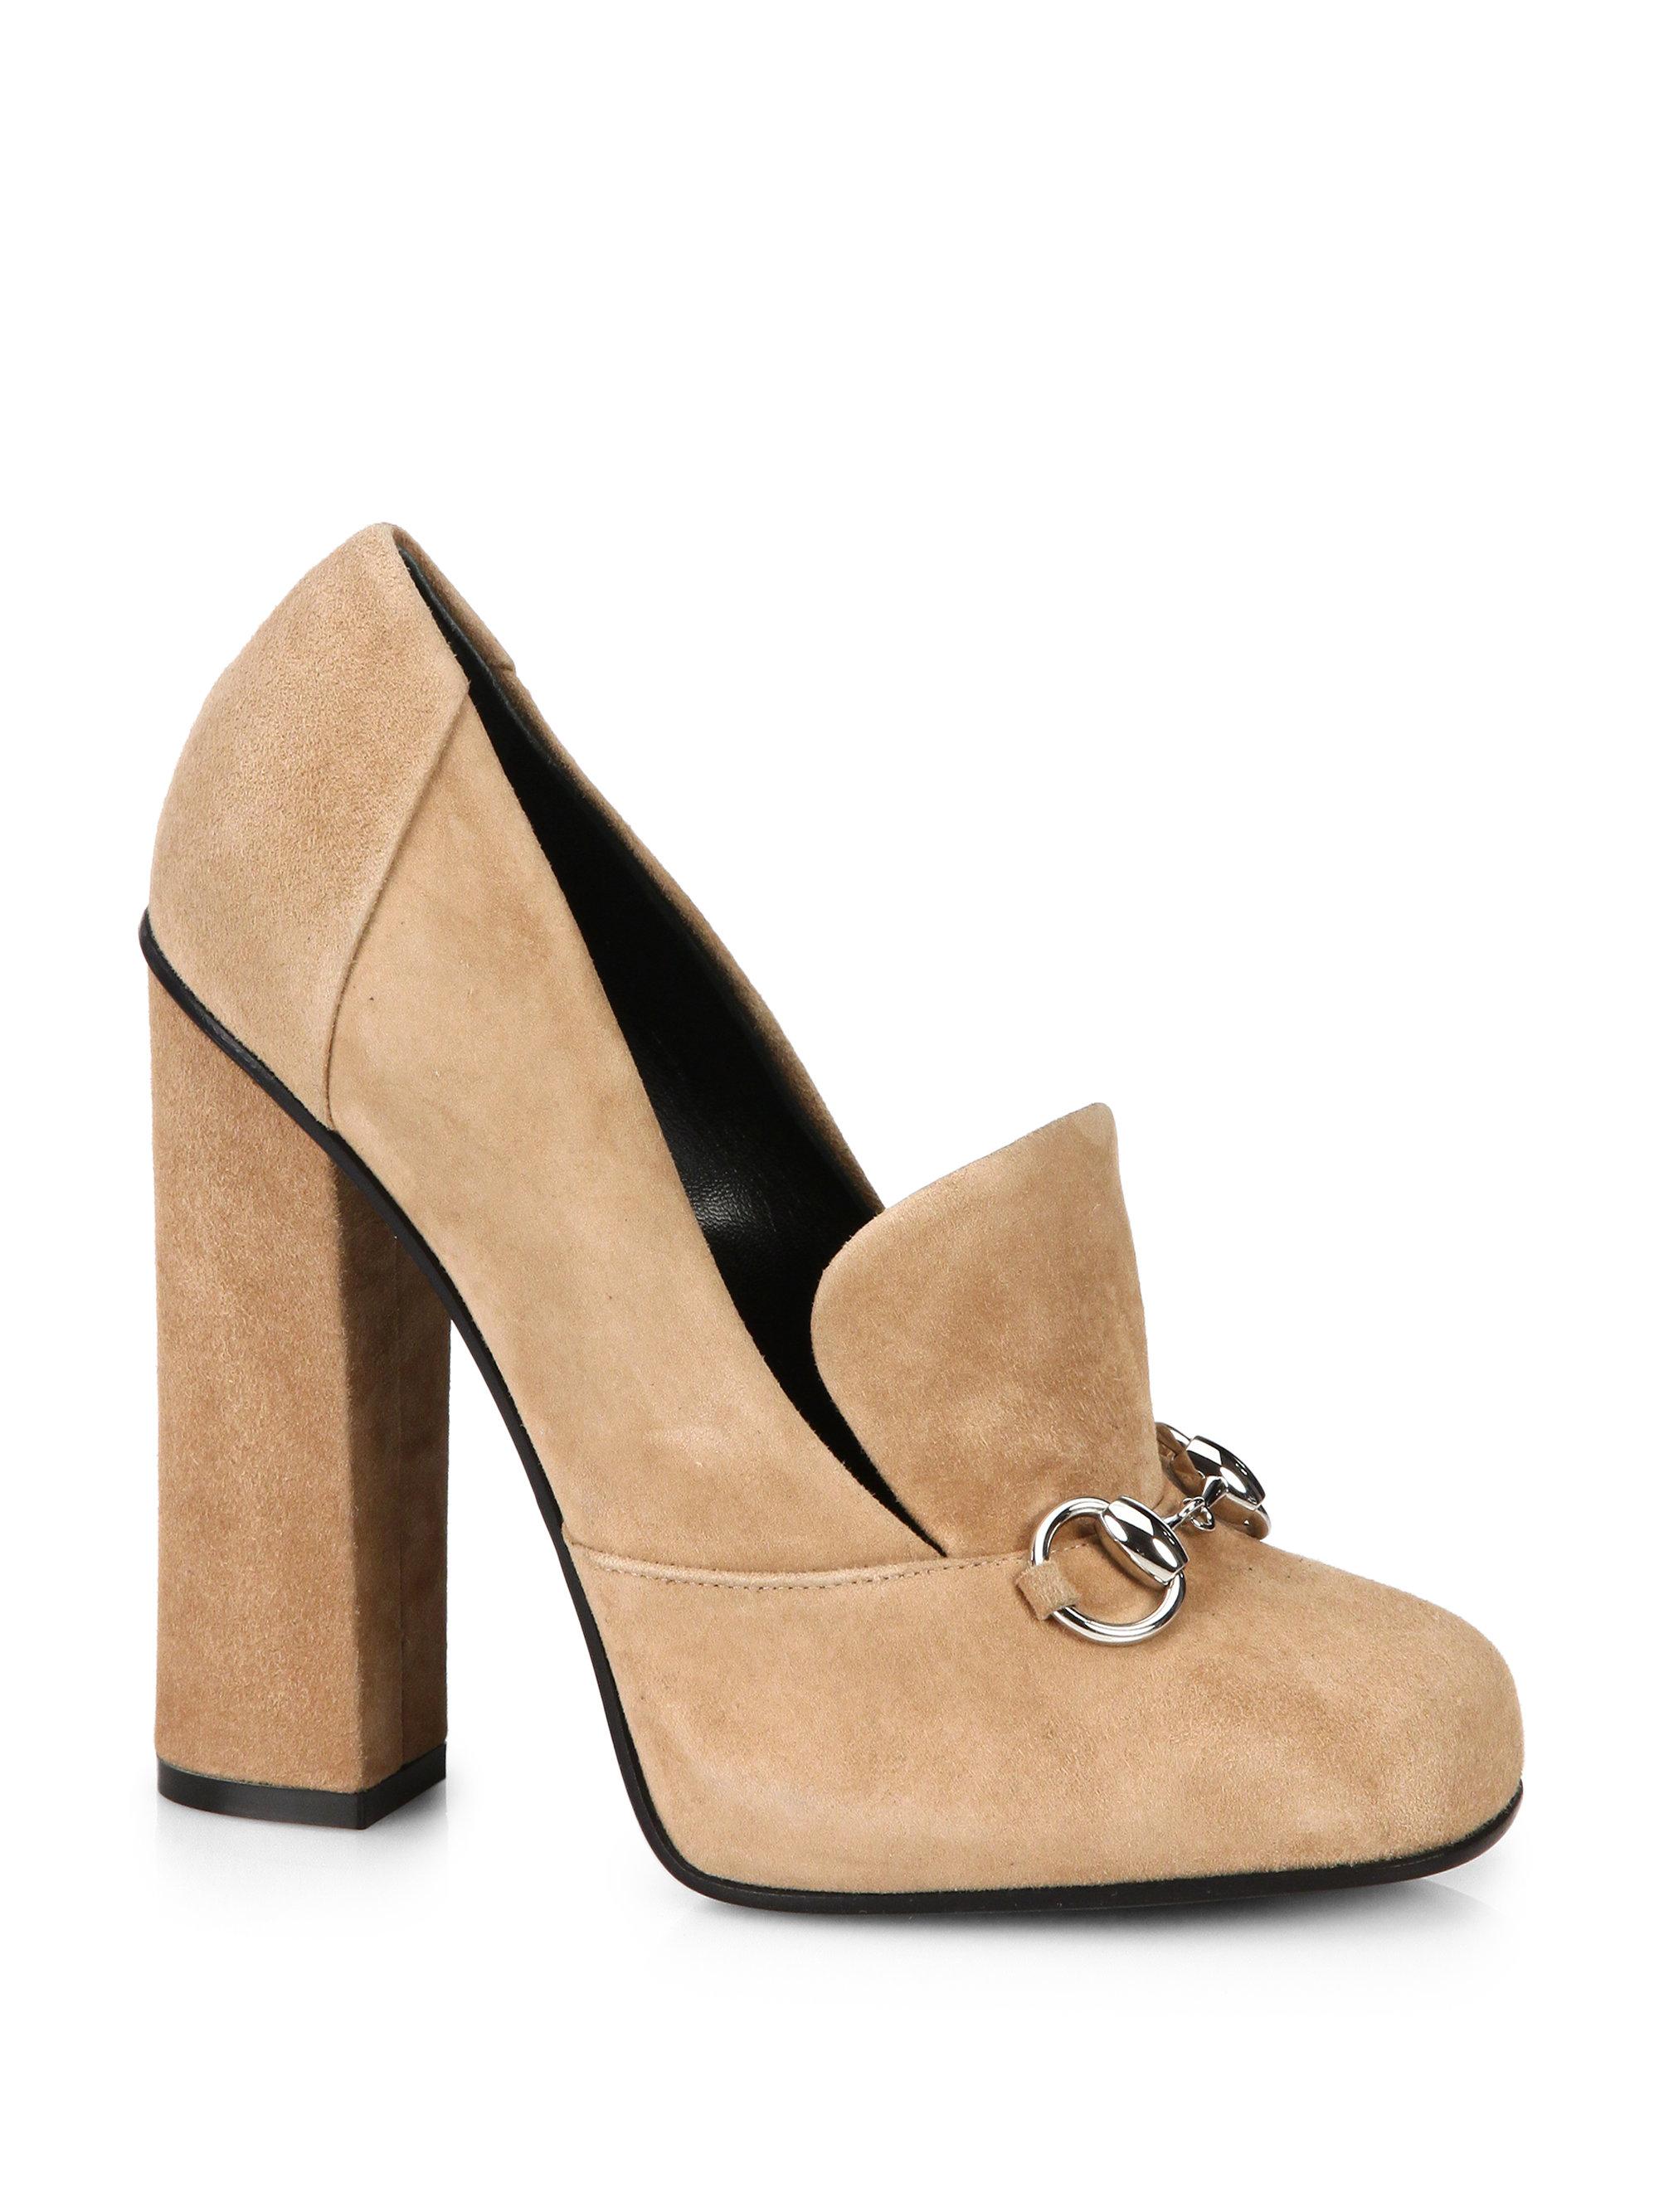 Nude Oxford Heels